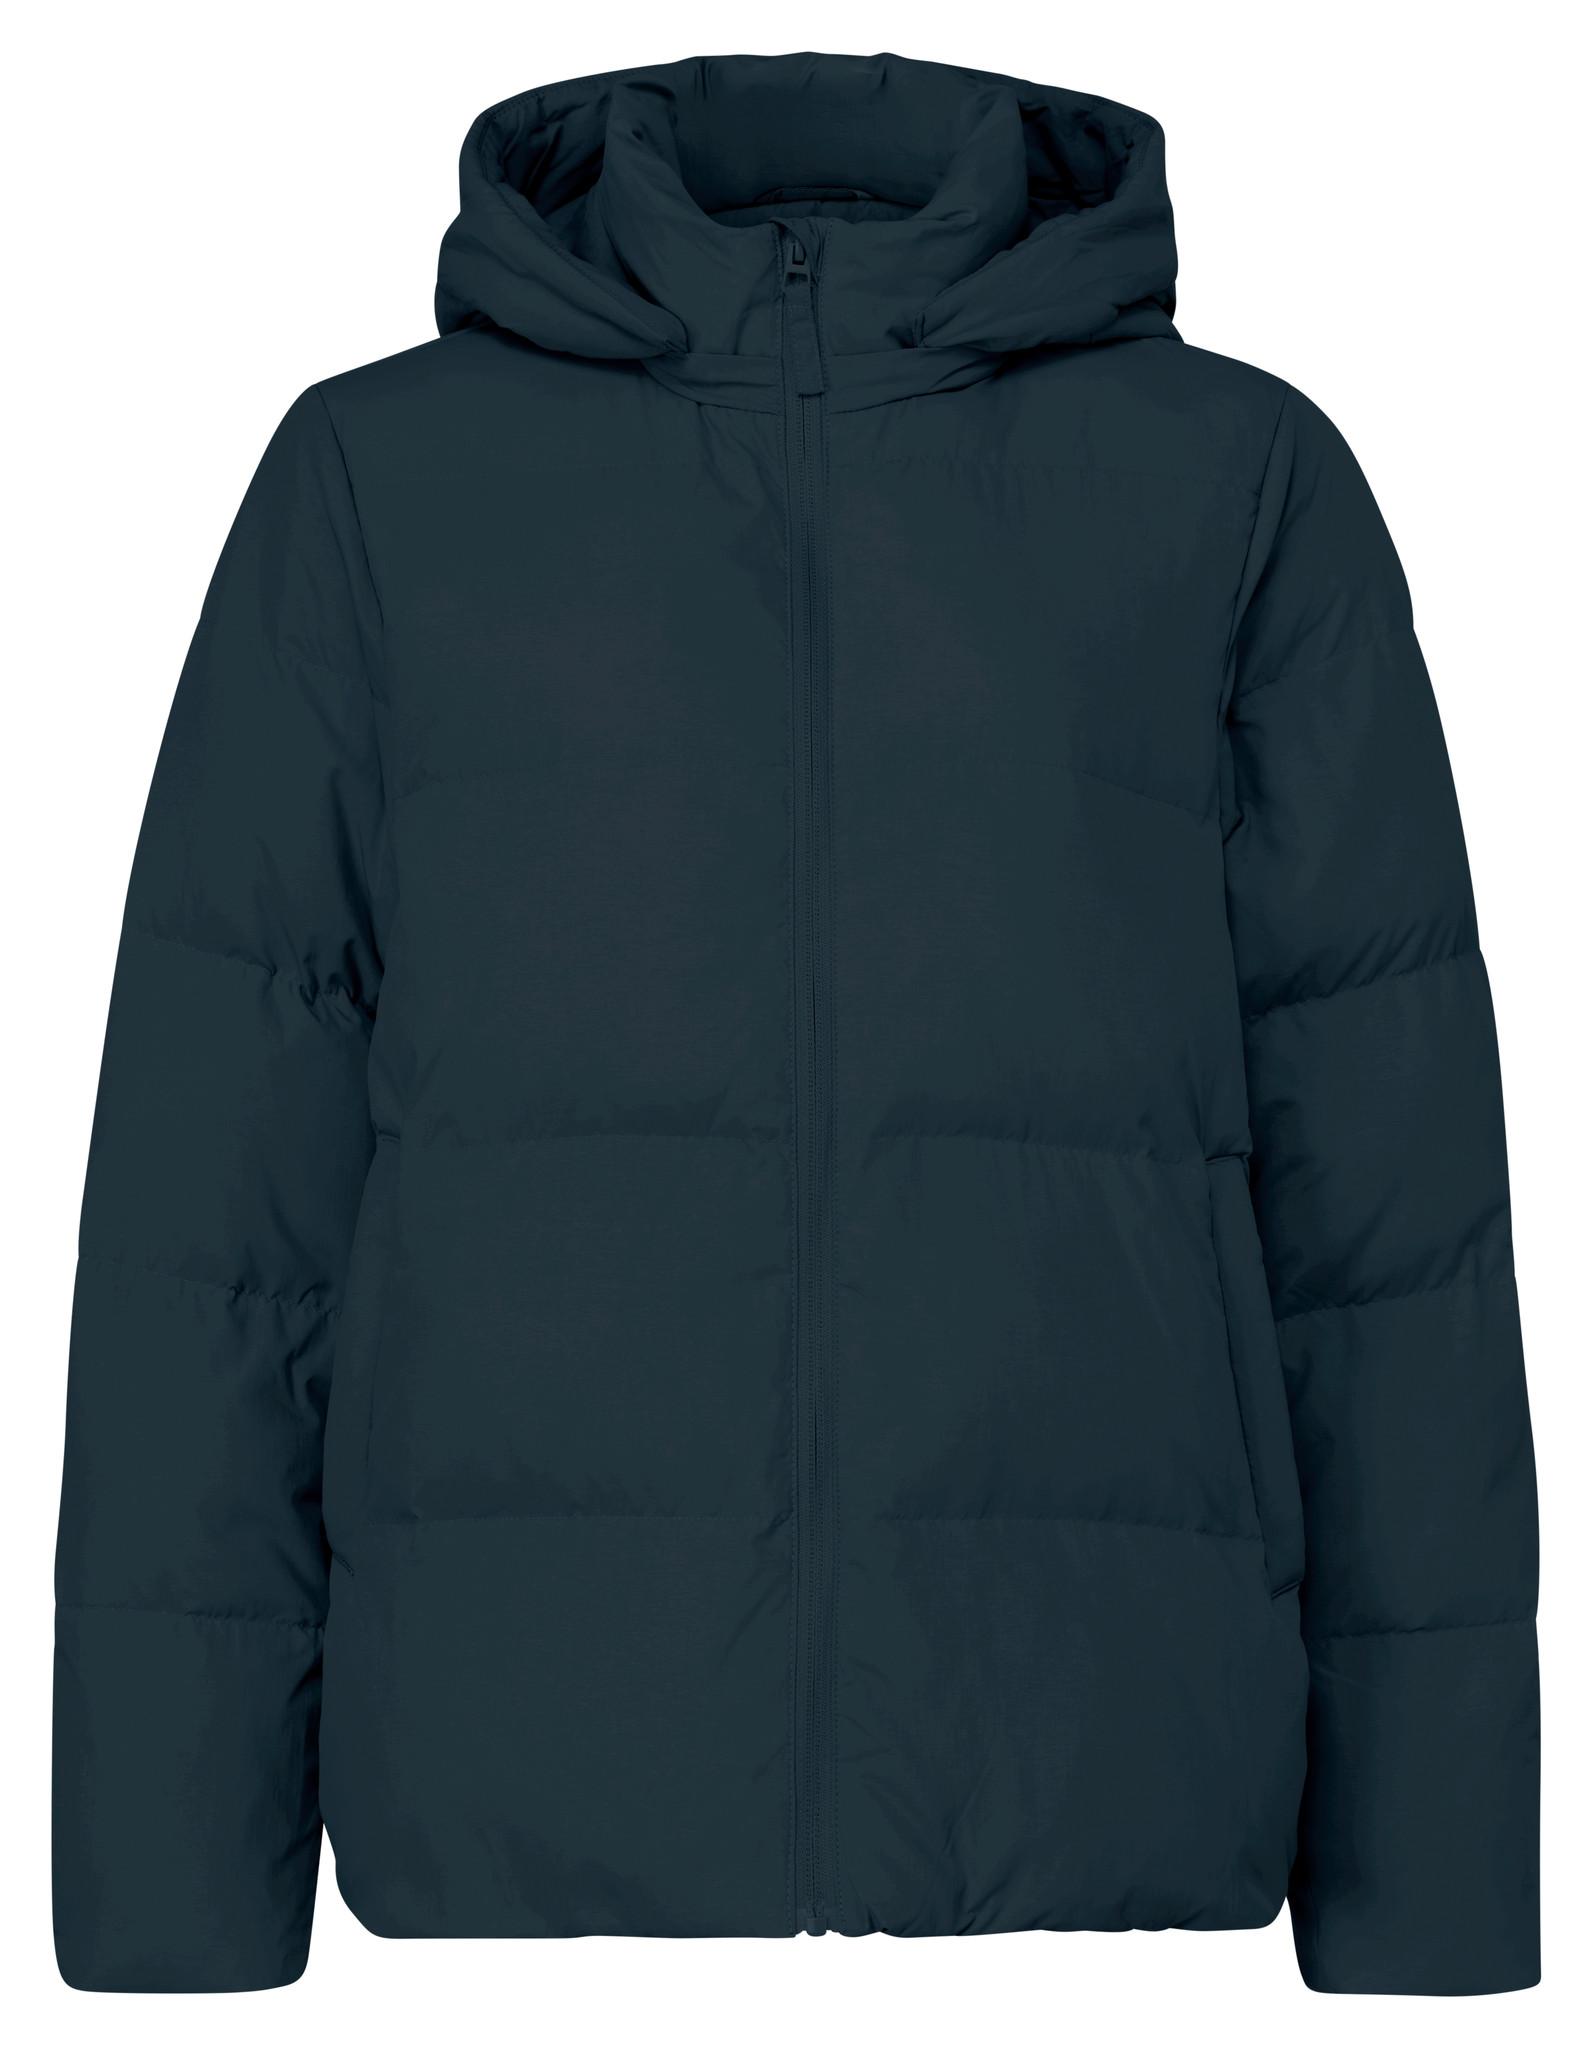 yaya Short puffer jacket 1621029-123-2